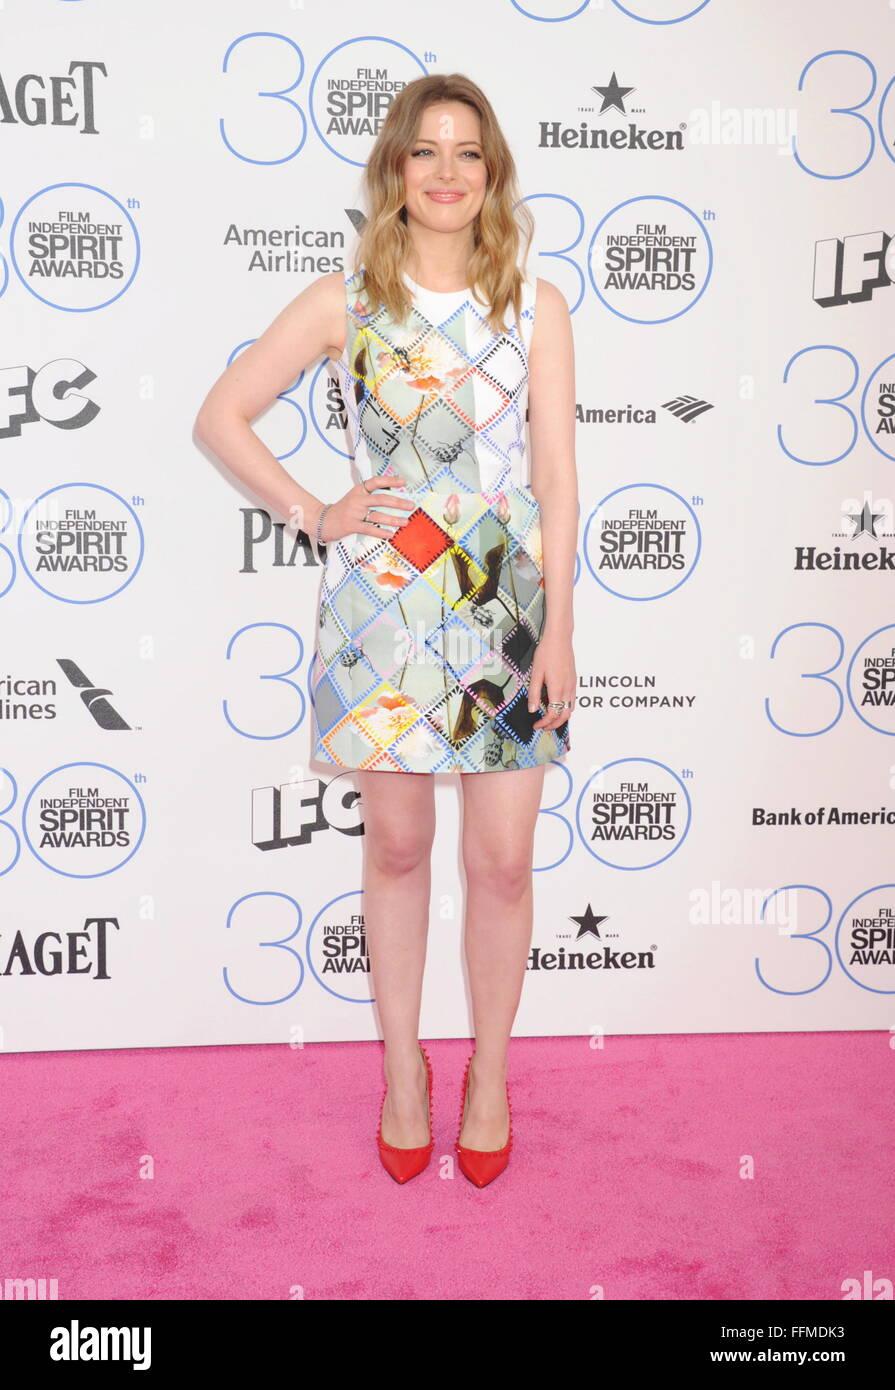 Schauspielerin Gillian Jacobs kommt an der 2015 Film Independent Spirit Awards am 21. Februar 2015 in Santa Monica, Stockbild